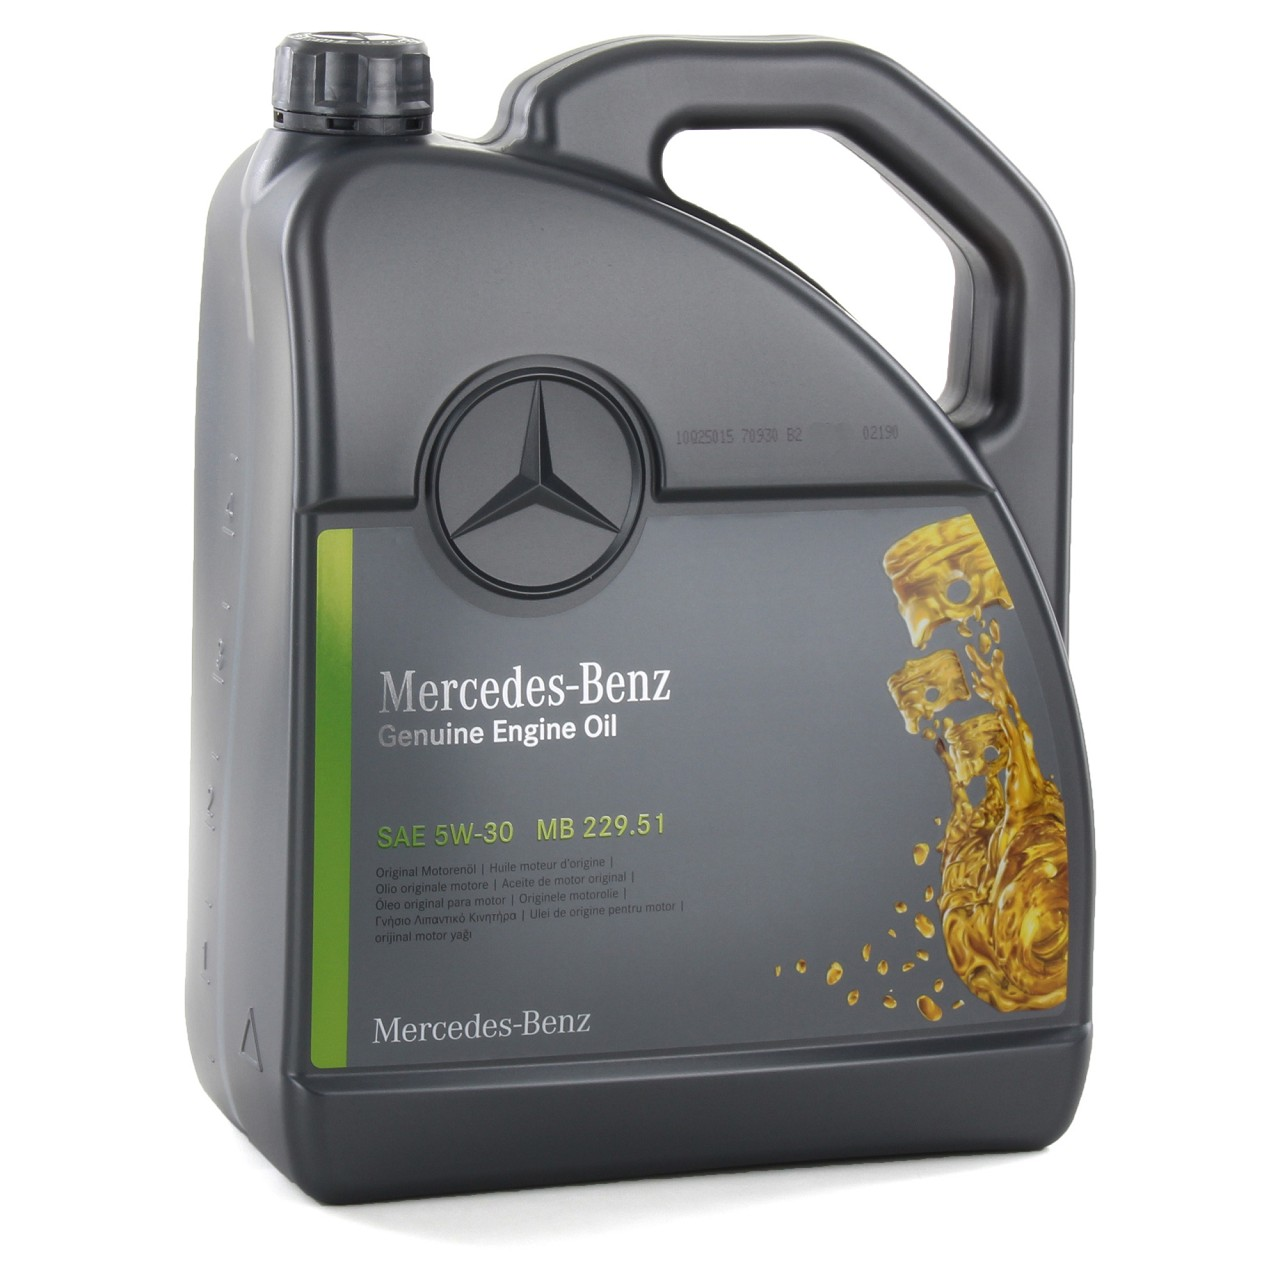 ORIGINAL Mercedes-Benz Motoröl Öl 5W-30 5W30 MB 229.51 5 Liter 000989940213ALEE